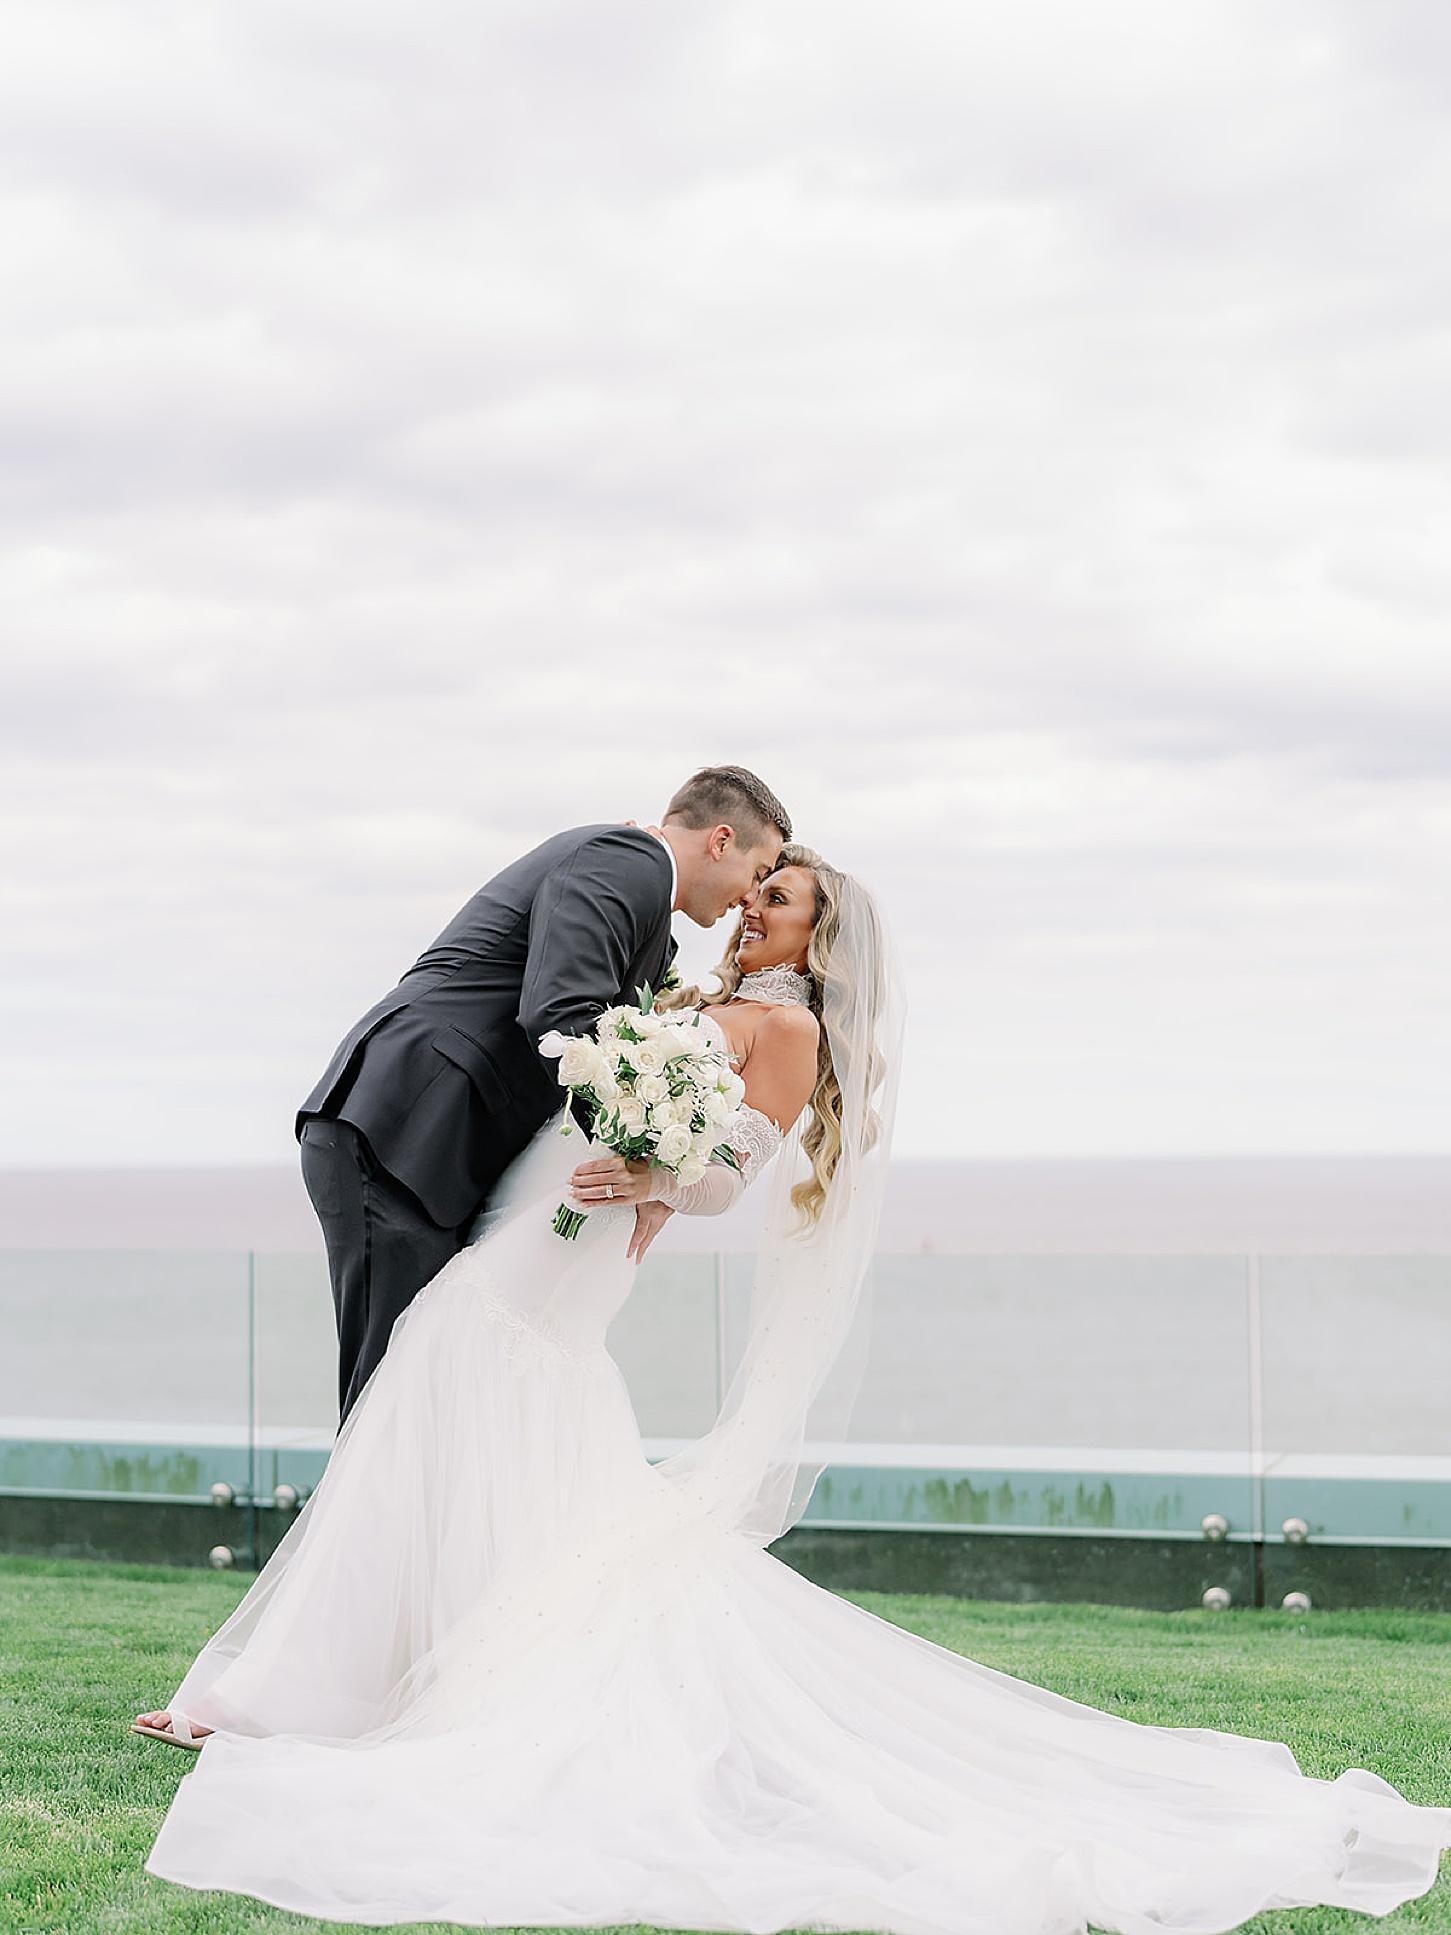 Atlantic City Wedding Photography Studio by Magdalena Studios Lexy Cha 0045